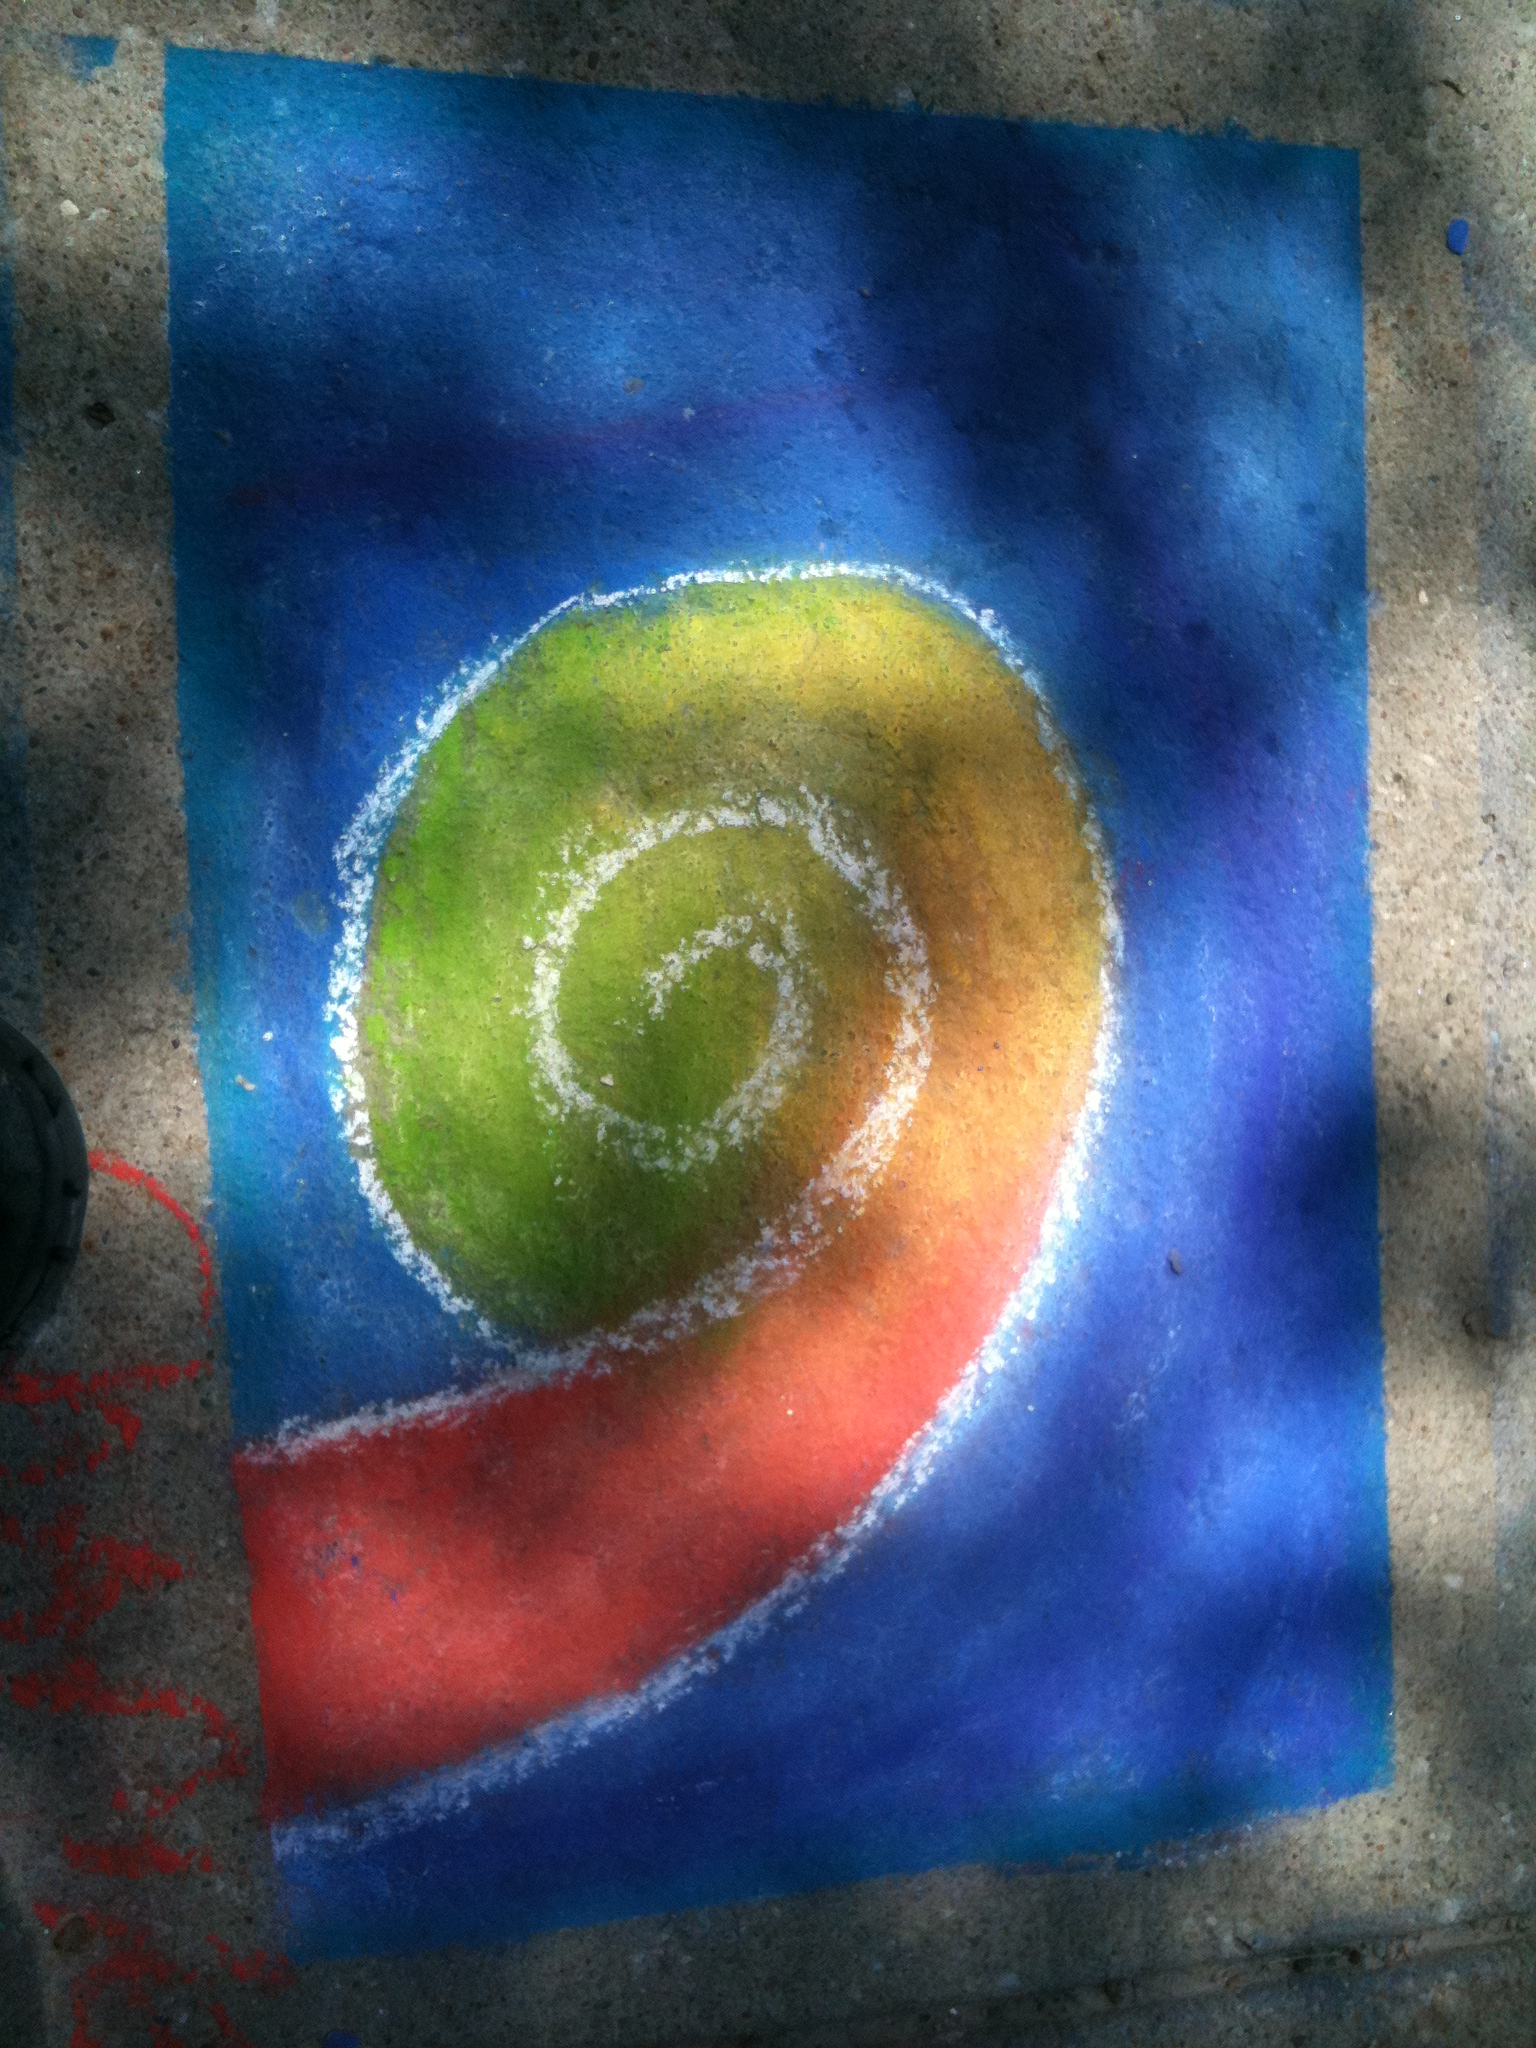 swirlz of chalk